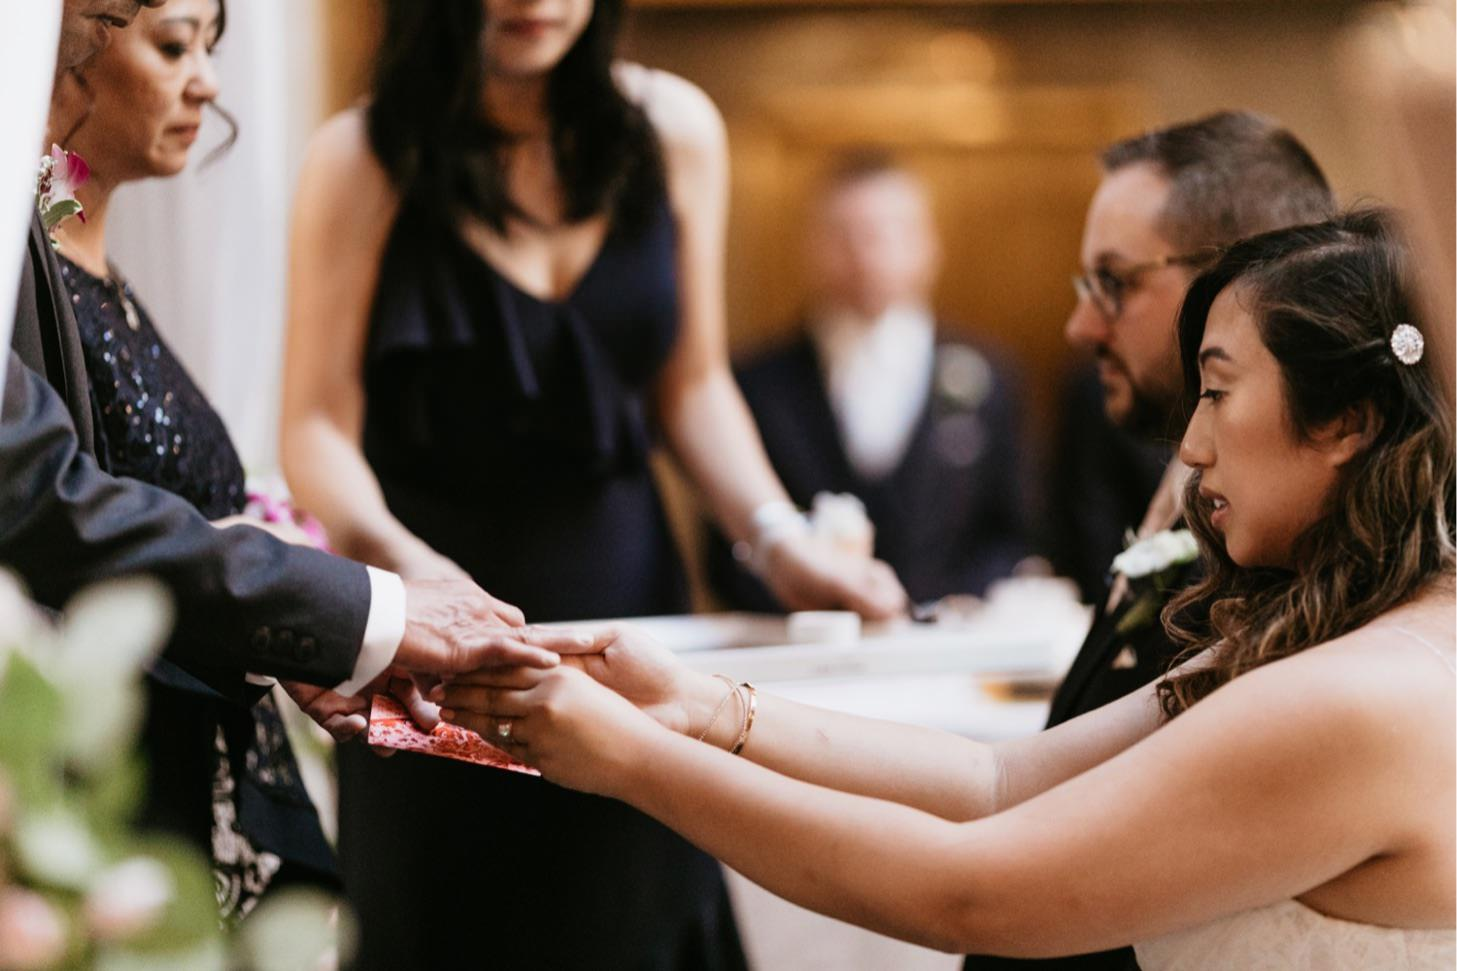 indiana-state-house-wedding-downtown-indianapolis-wedding-photographer042.JPG